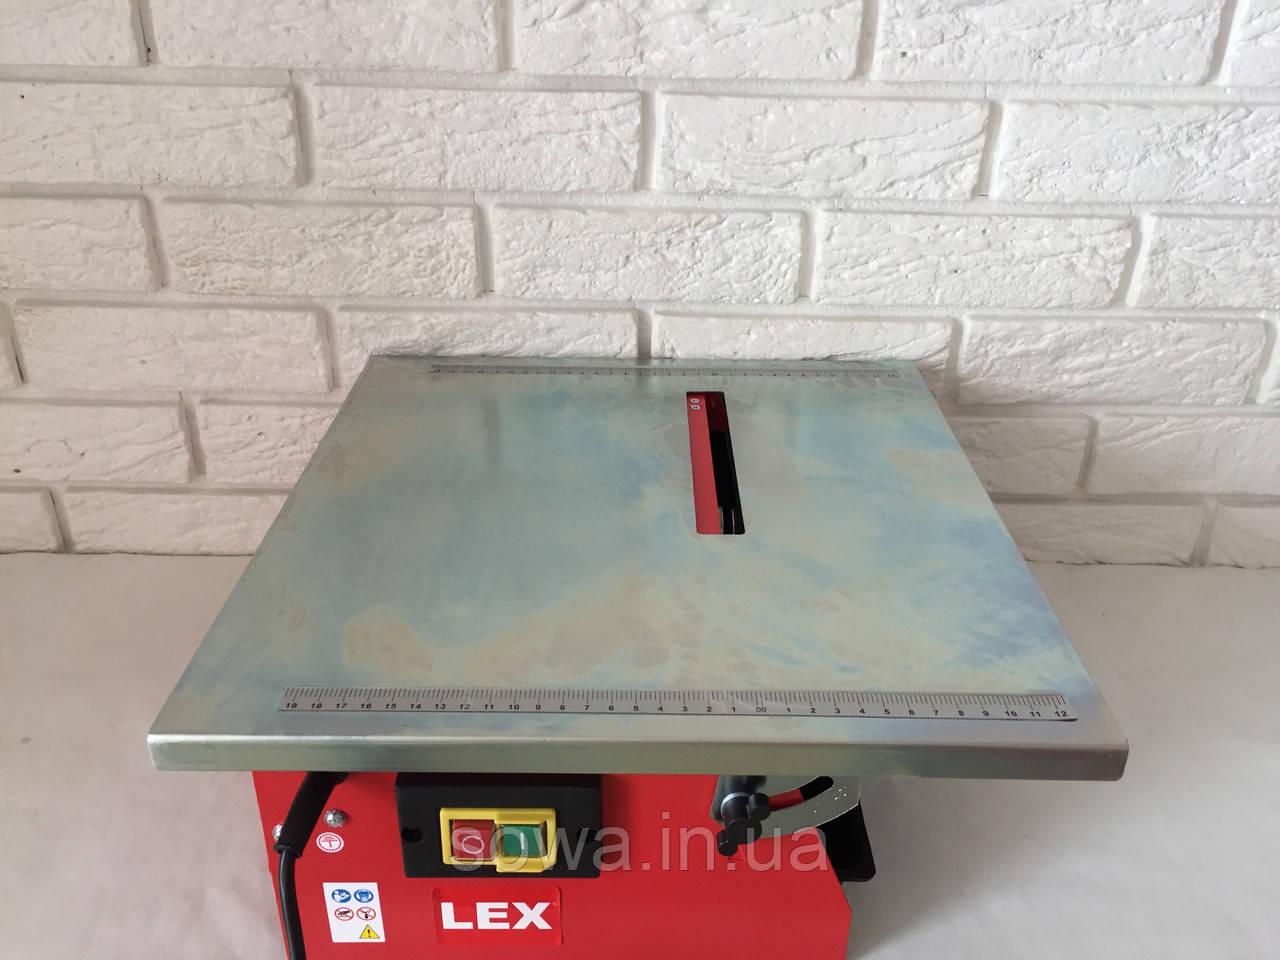 ✔️ Плиткоріз електричний, Электроплиткорез - LEX LXSM16